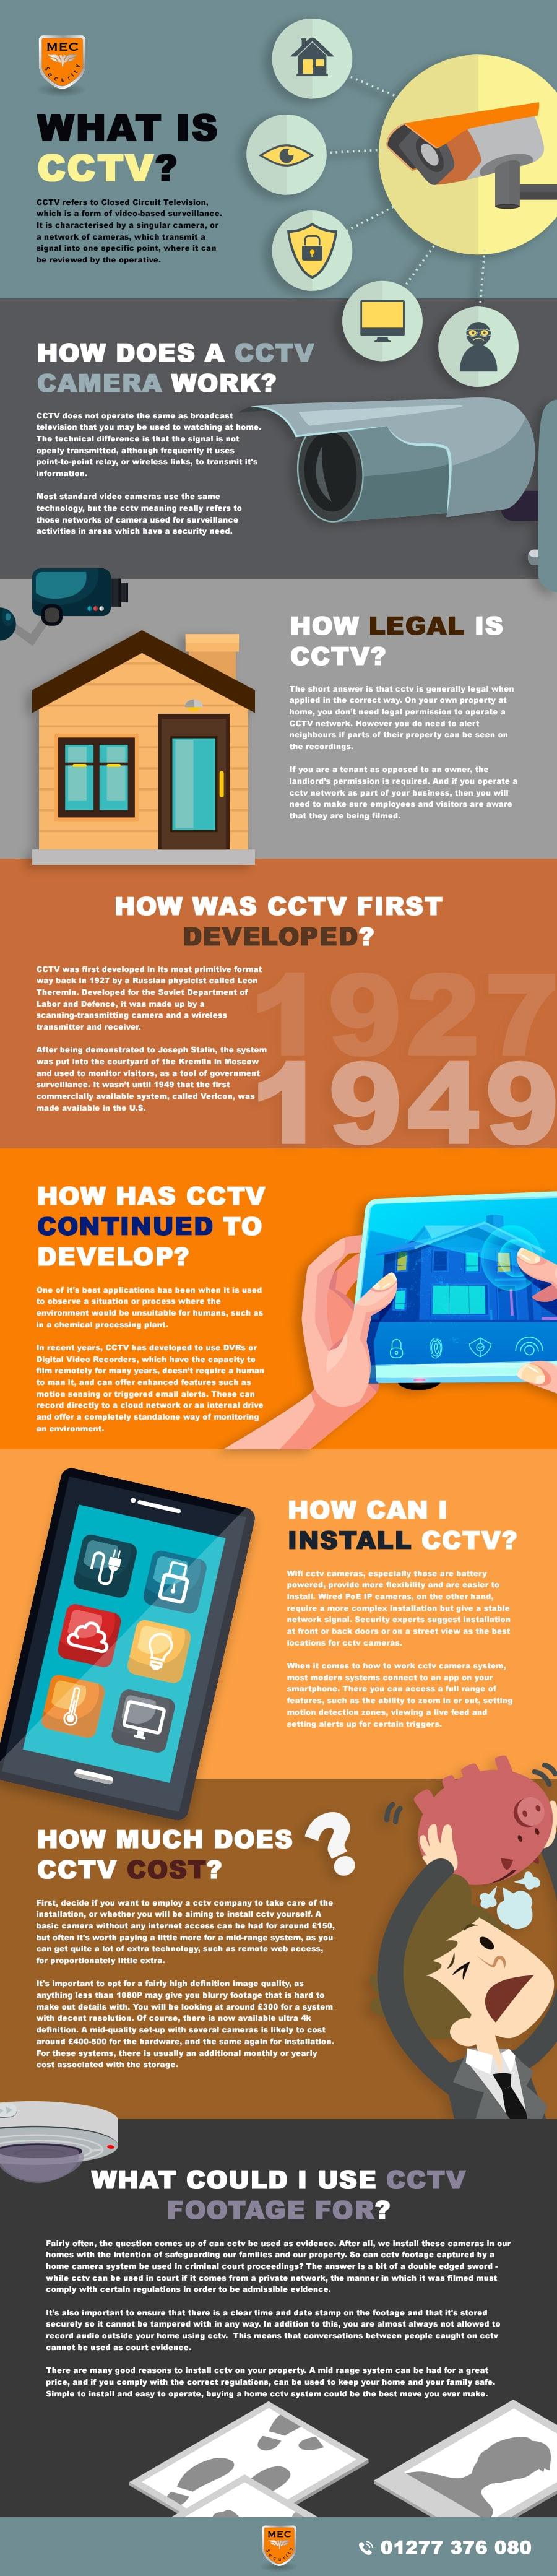 cctv camera cost infographic